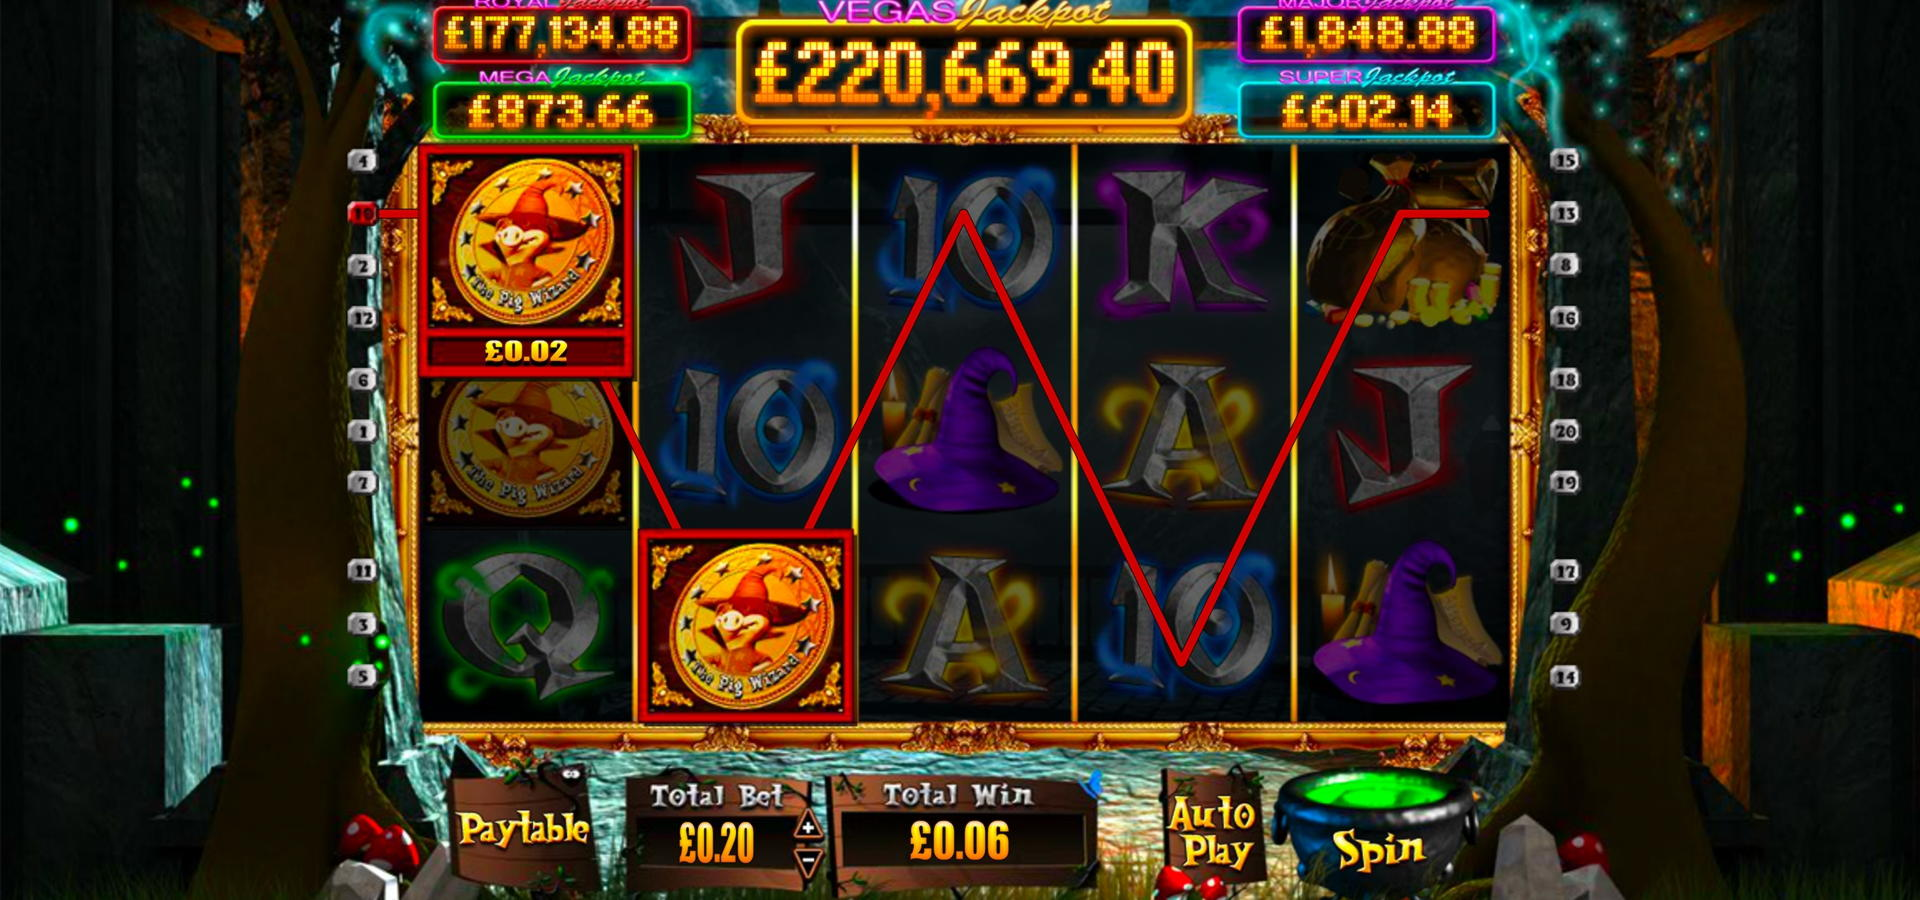 270 Free spins no deposit at Slotscom Casino